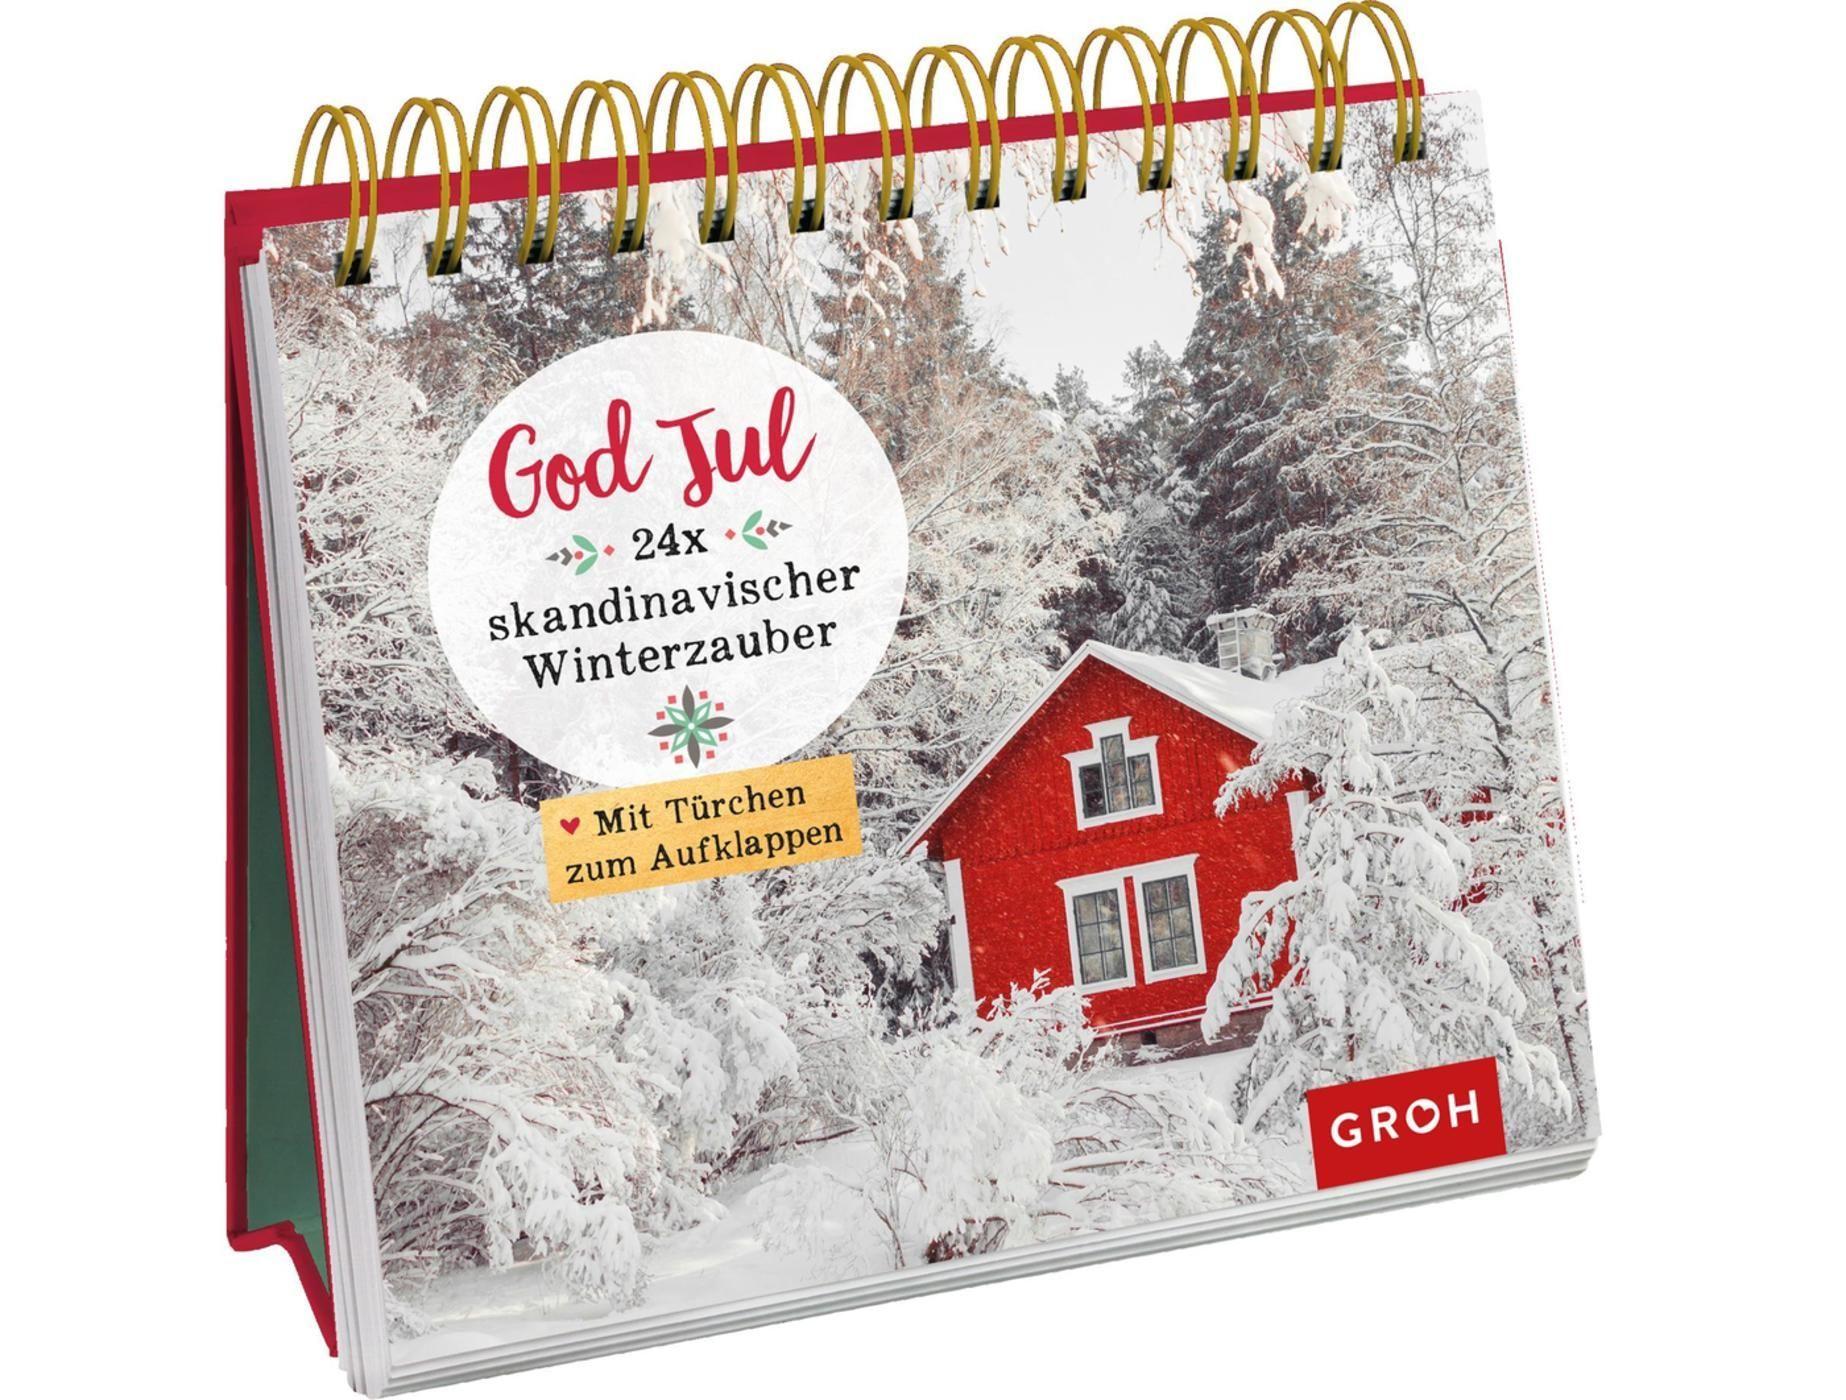 God Jul 24x skandinavischer Winterzauber - Aufstellbuch